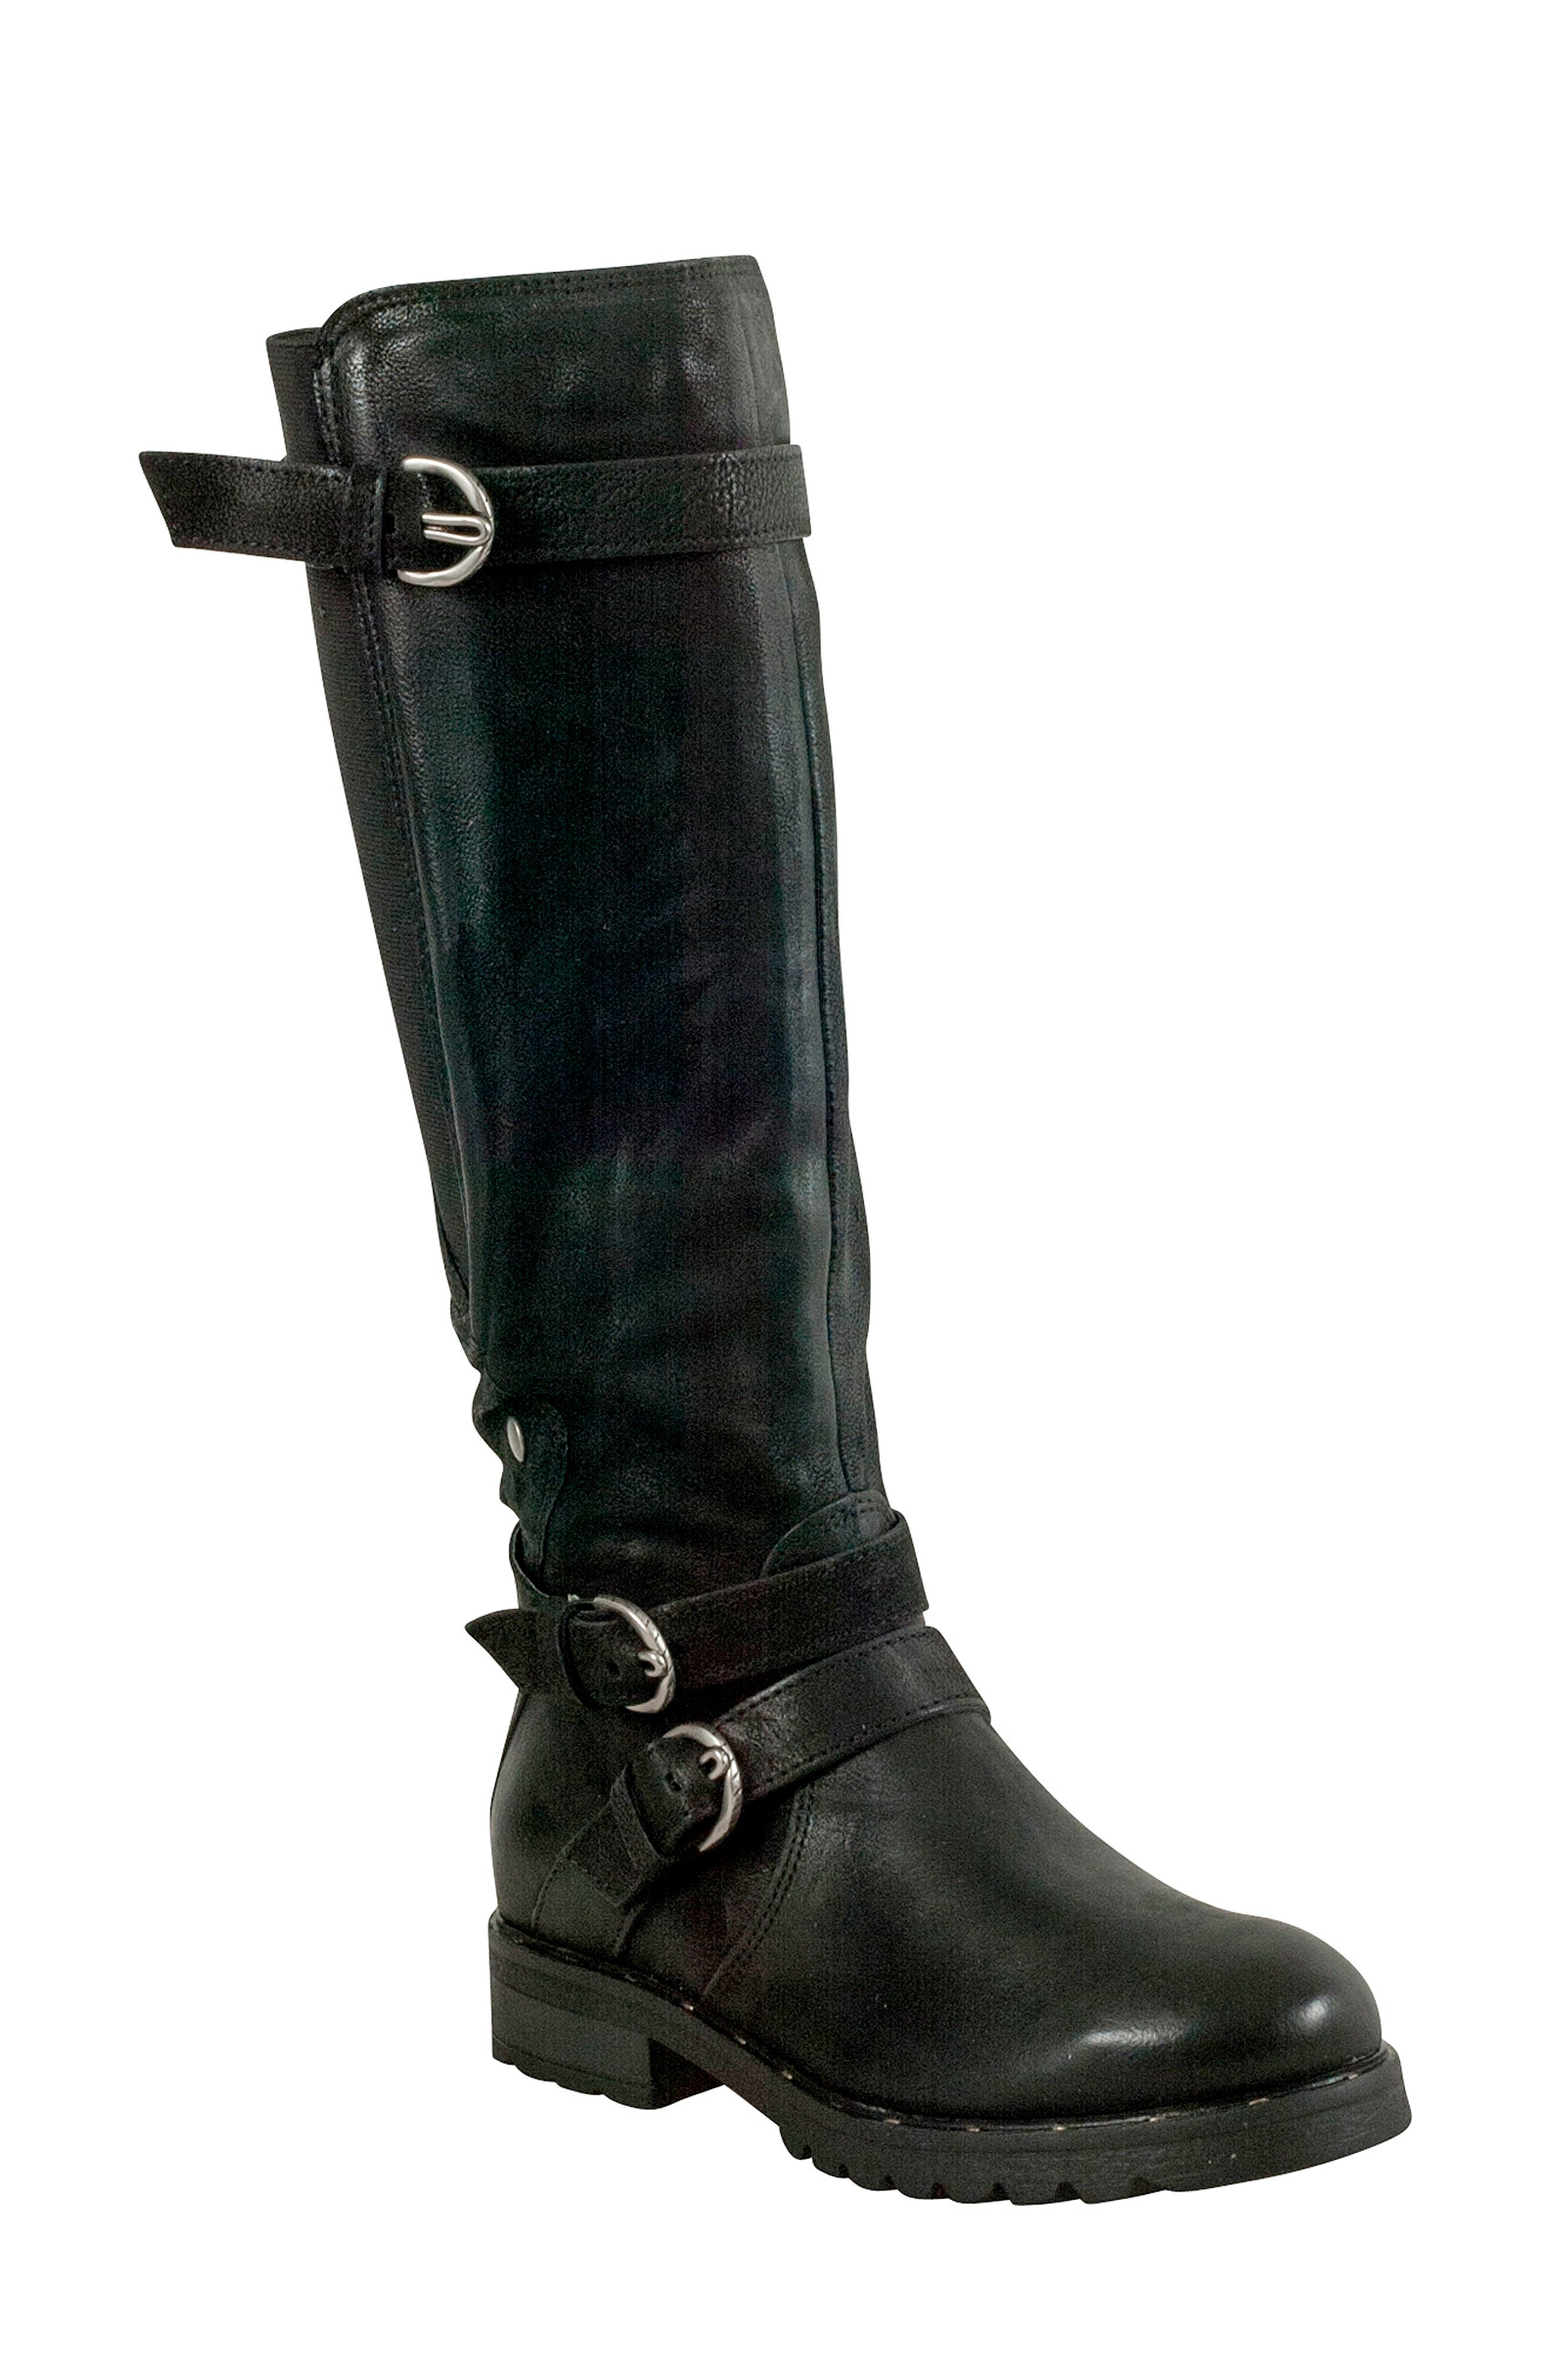 Miz Mooz Prim Knee High Boot, Black